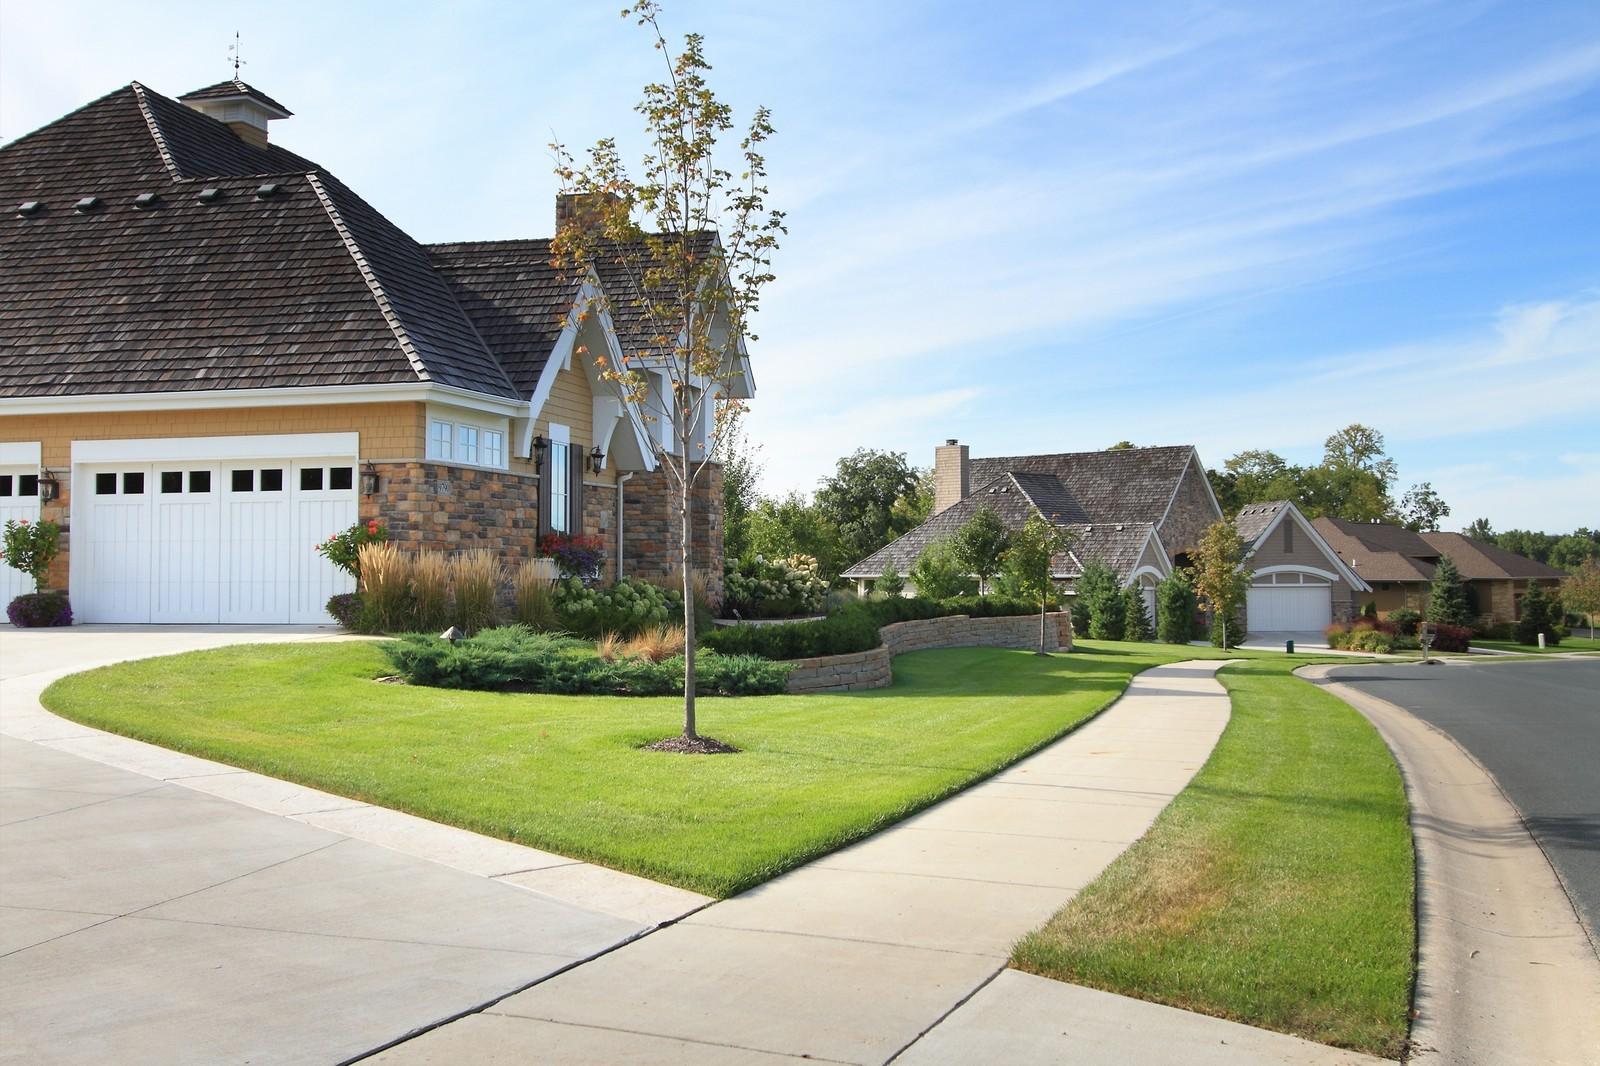 Real Estate Photography - 9627 Sky Lane, Eden Prairie, MN, 55347 - Front View